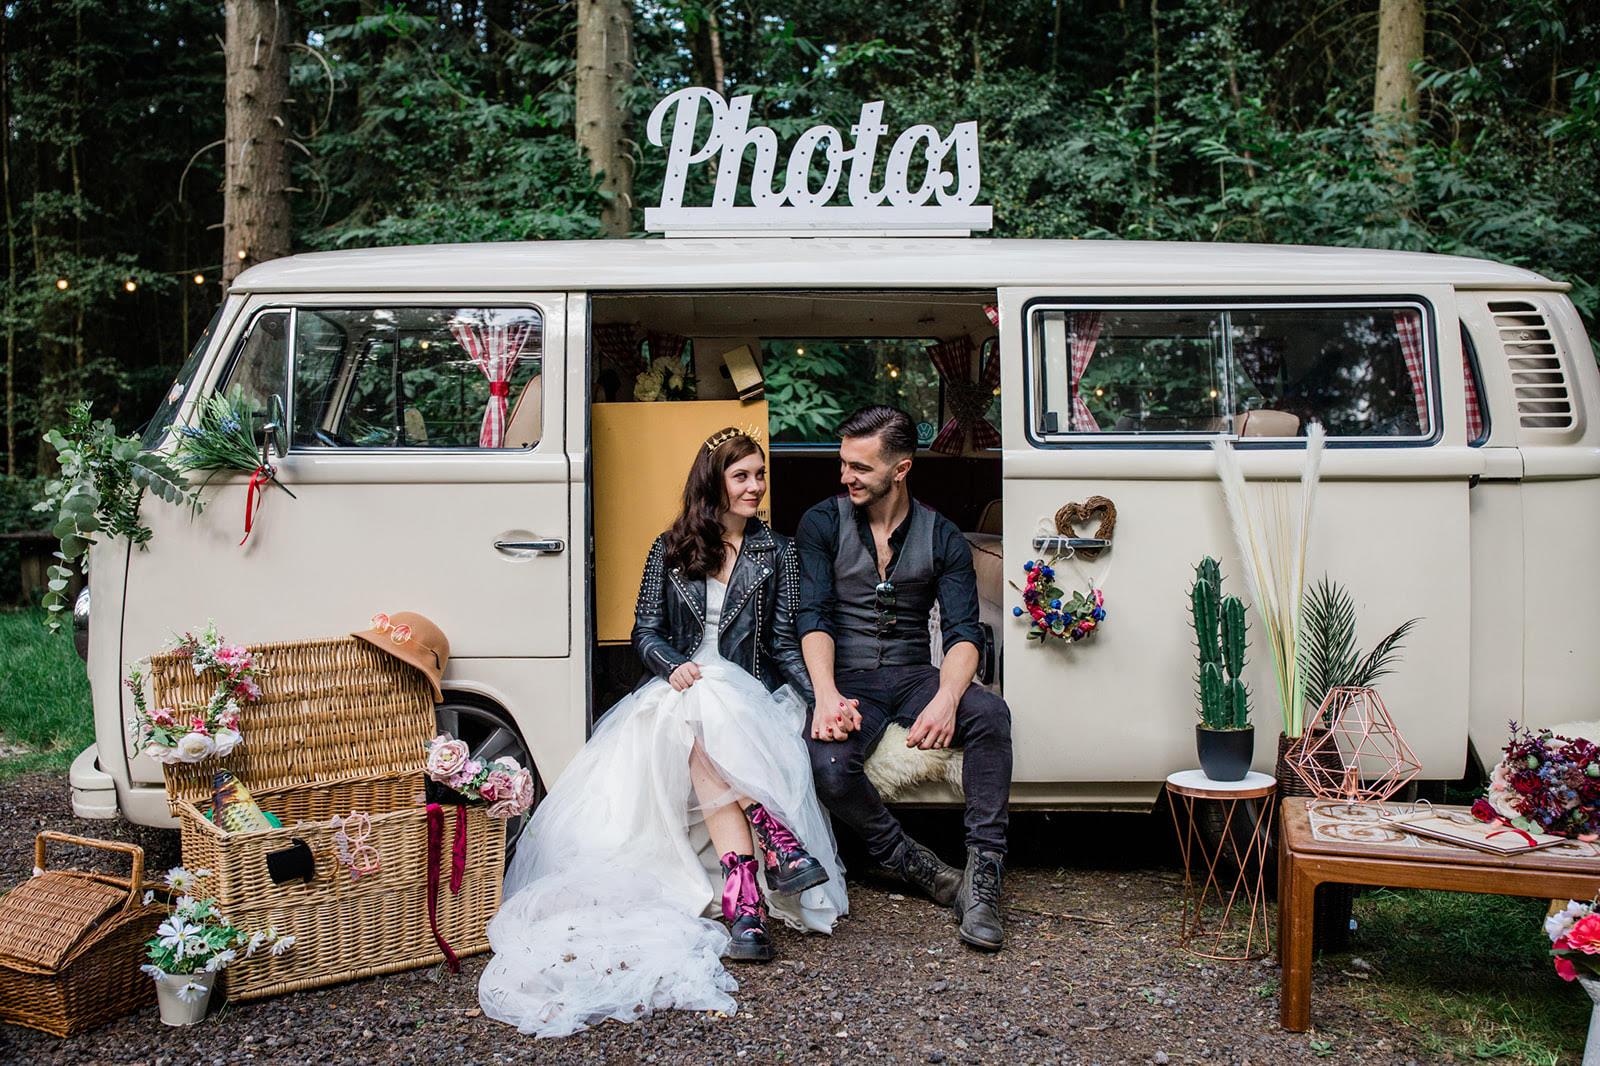 unique wedding photo booths - camper van photo booth - unique wedding campervan - camper van wedding - unique wedding - alternative wedding - unconventional wedding